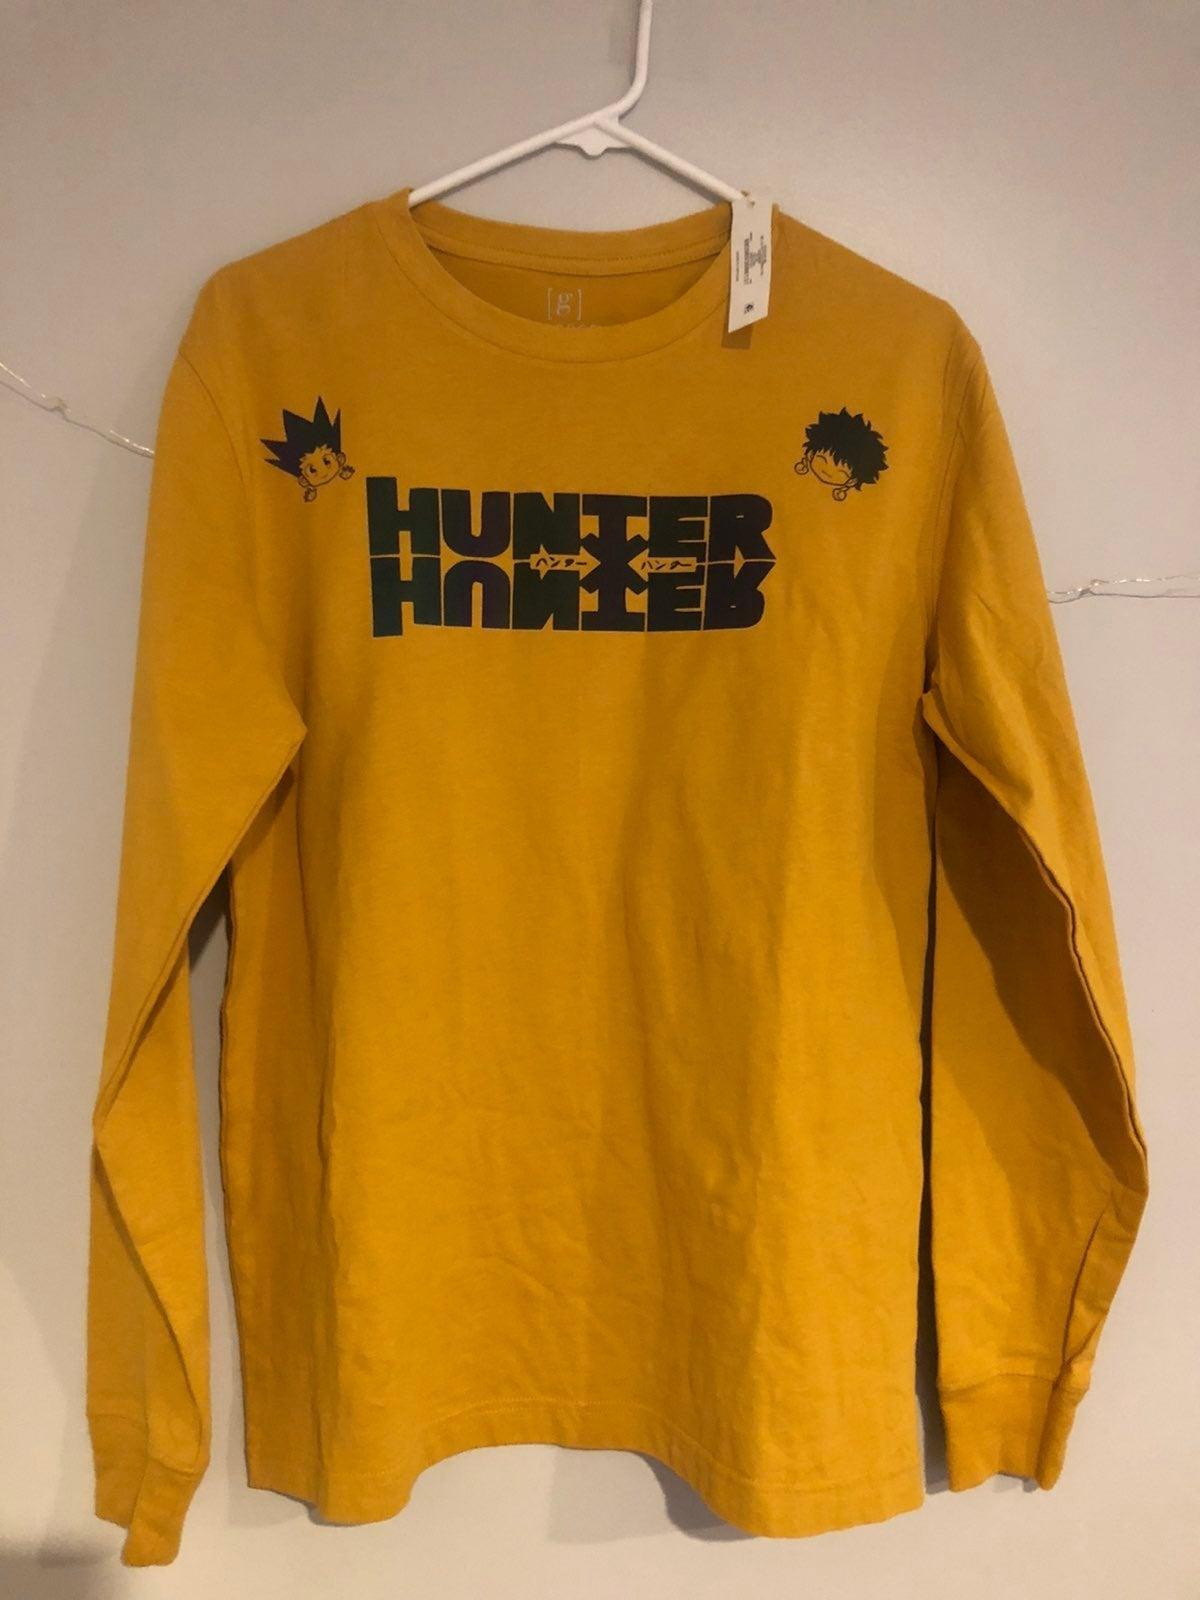 Hunter x hunter Gon and Killua Shirt